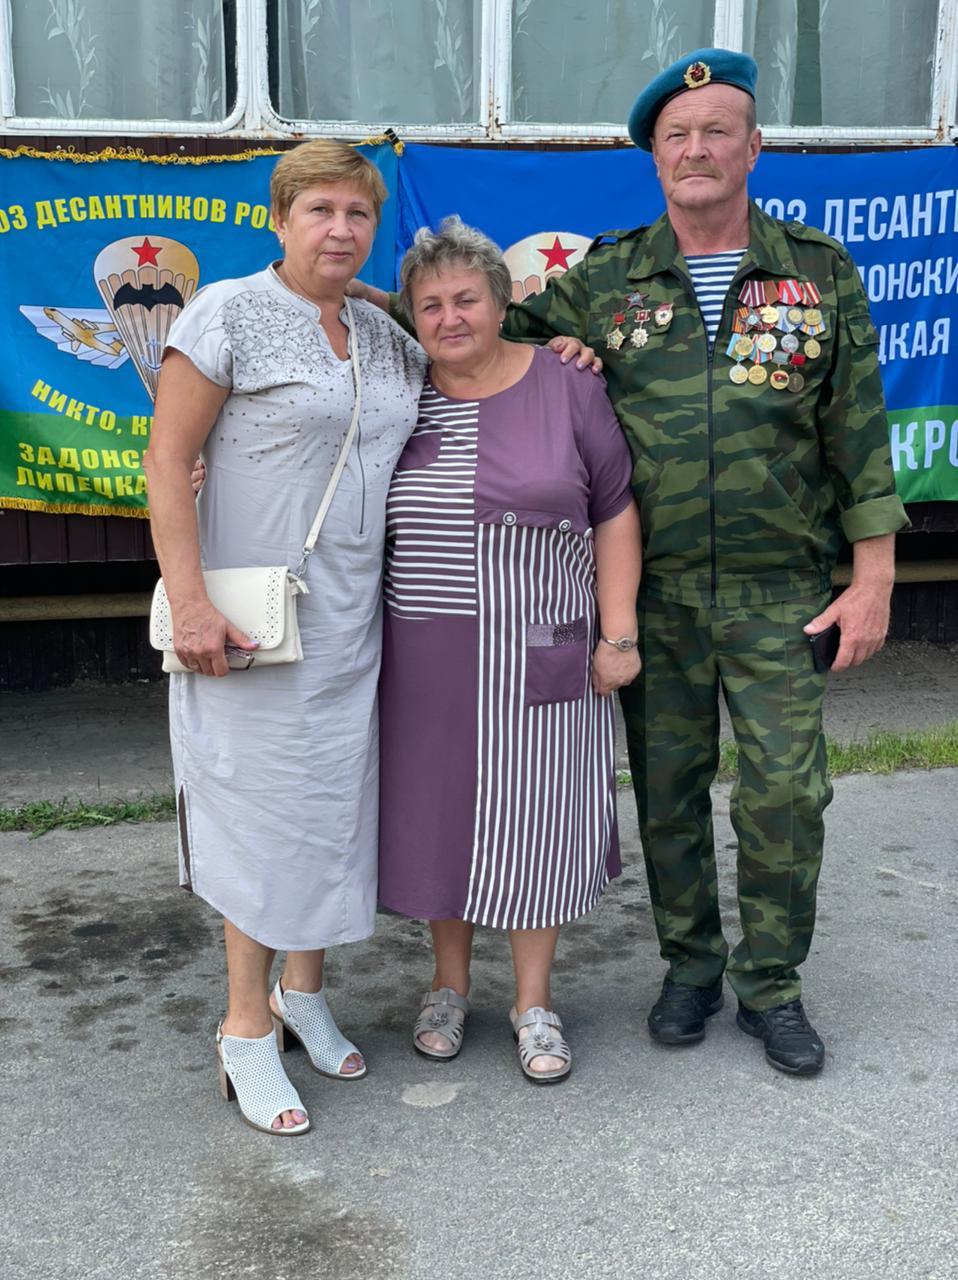 Роману Пахомову посвящается